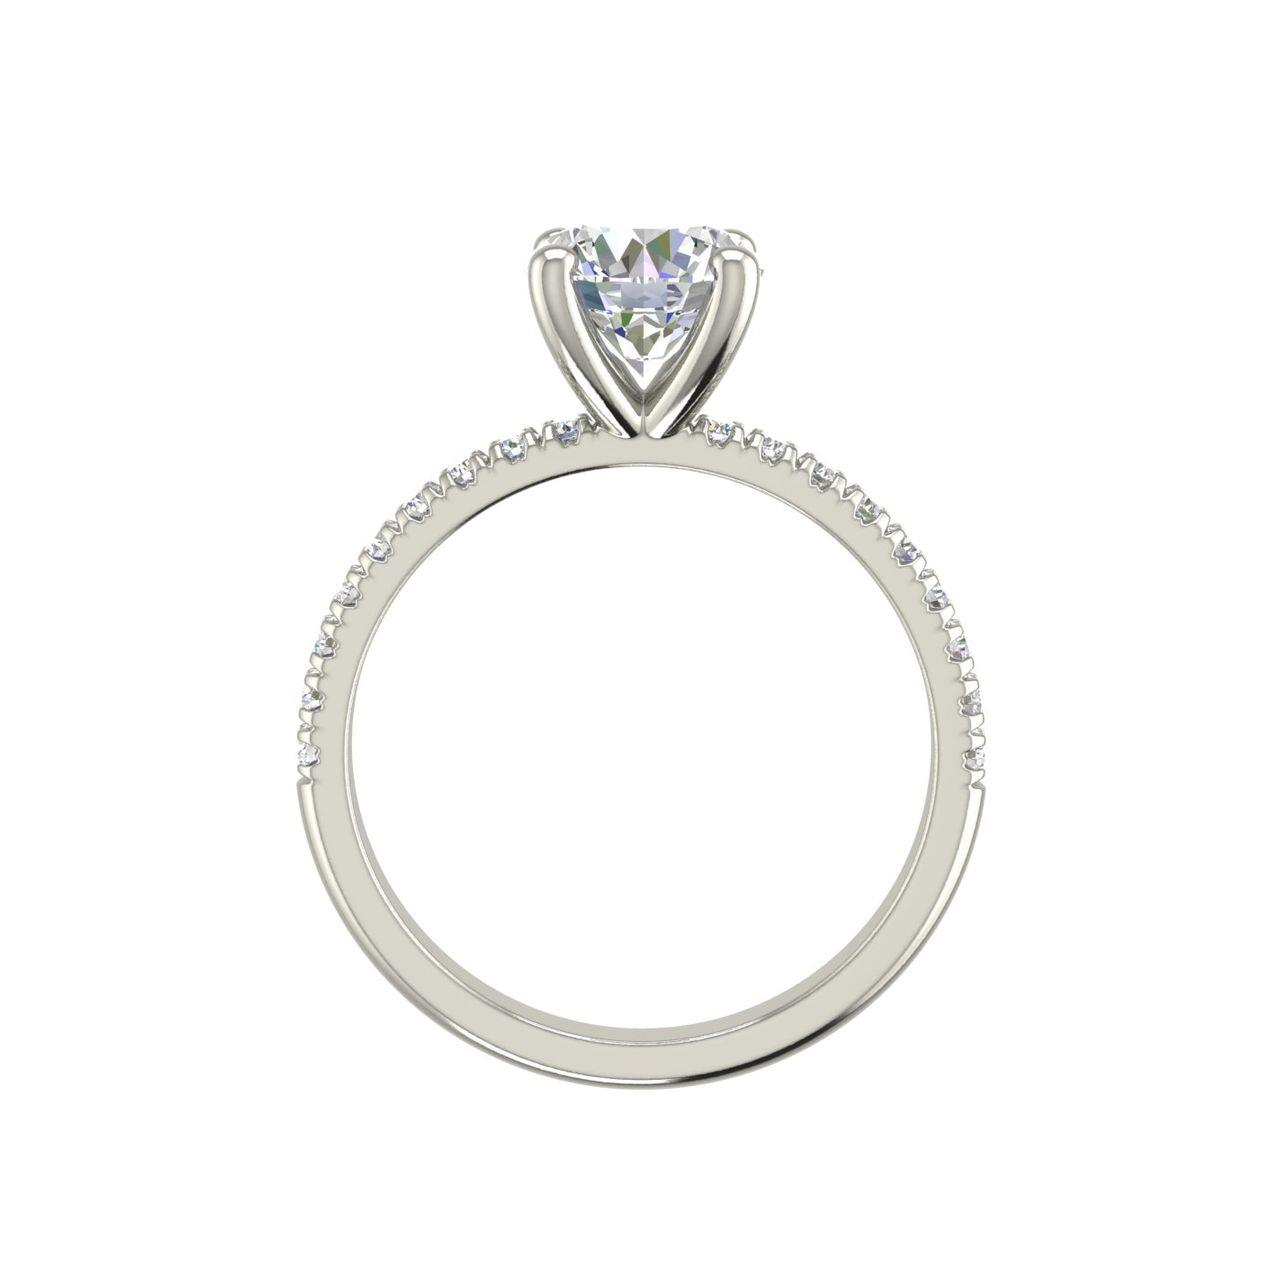 Pave Flush Fit 1.35 Carat Round Cut Diamond Engagement Ring 1